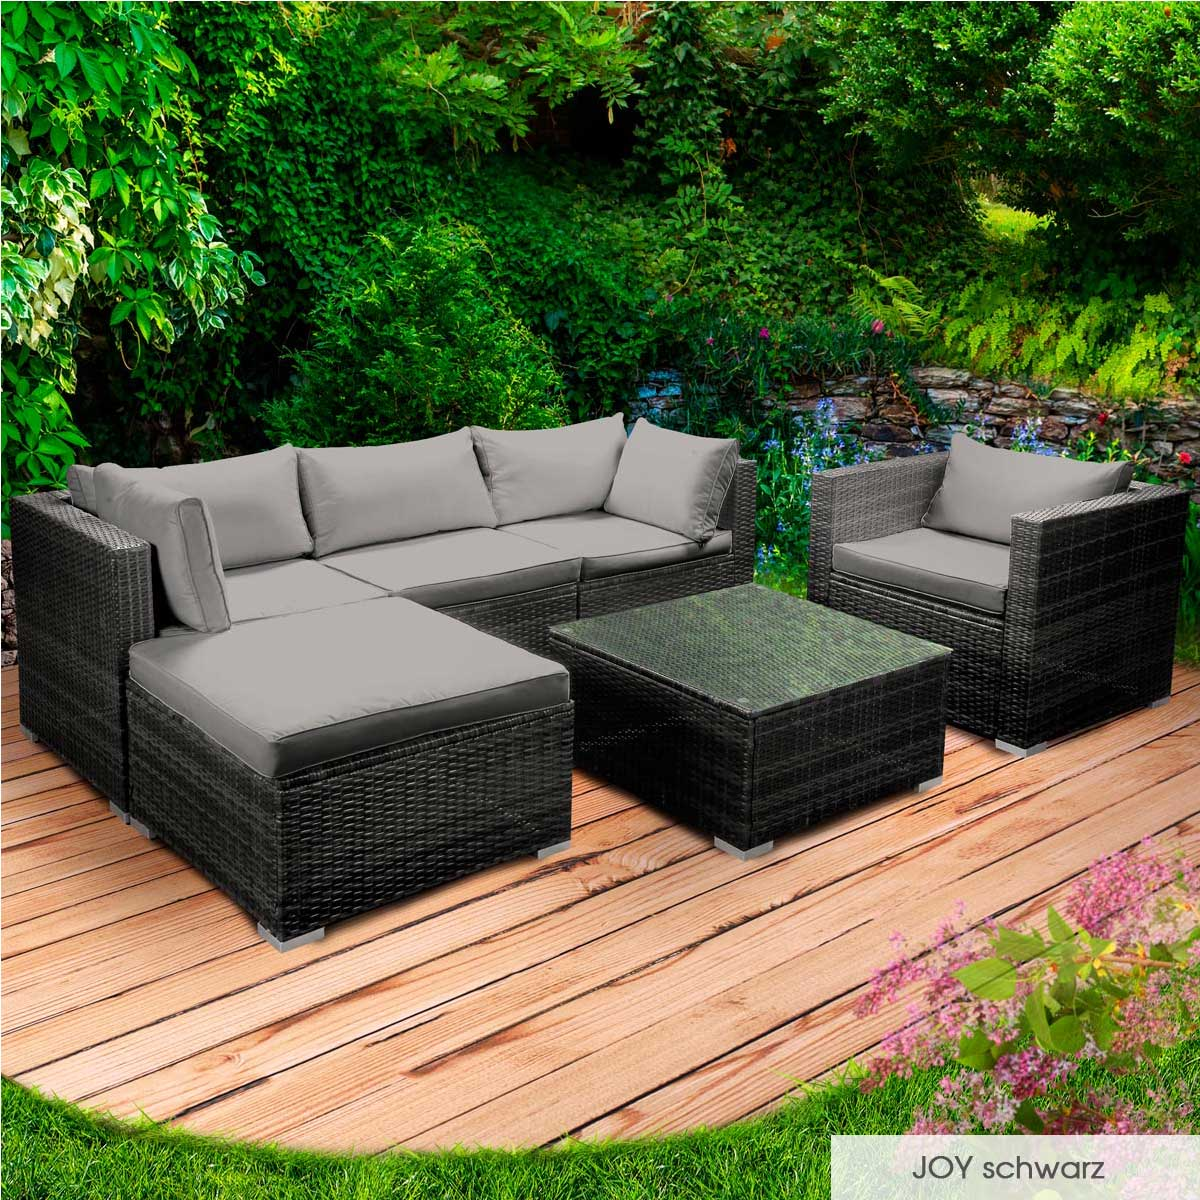 Gartenmoebel-Poly-Rattan-Lounge-Moebel-Sitzgarnitur-Gartengarnitur-Sitzgruppe-Sofa Indexbild 66